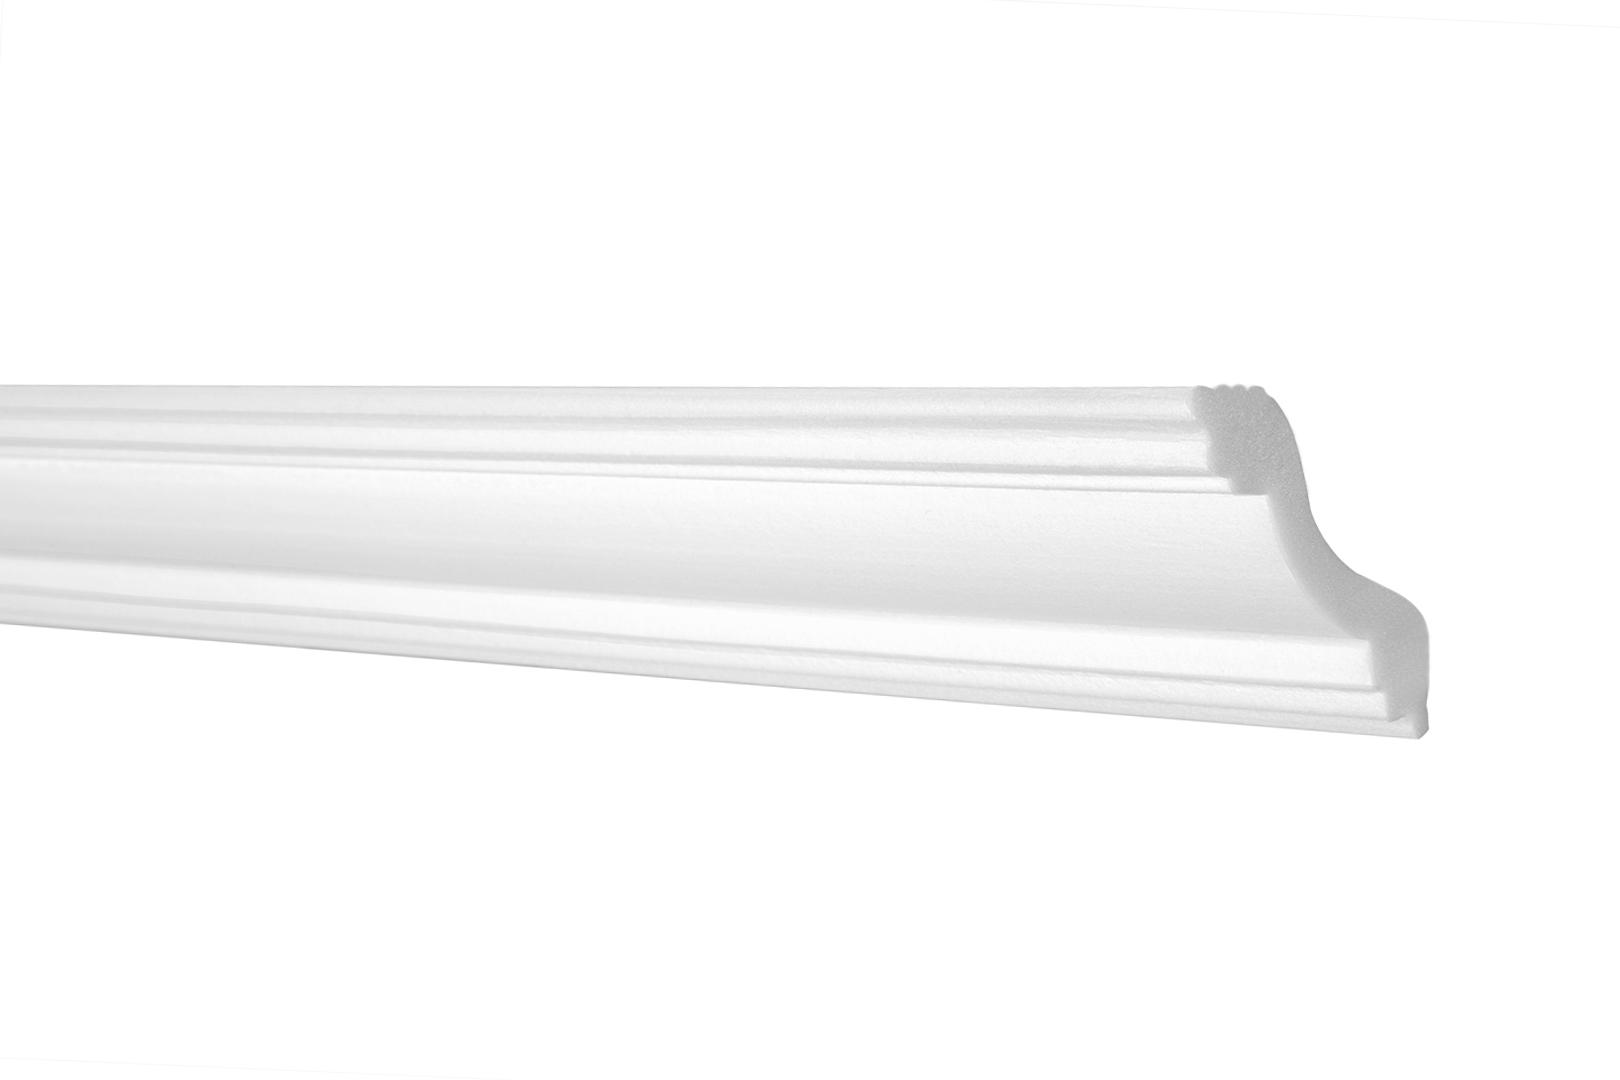 10 Meter Zierleiste Stuckleiste Eckprofil Styroporleiste XPS stabil 35x35mm E-11